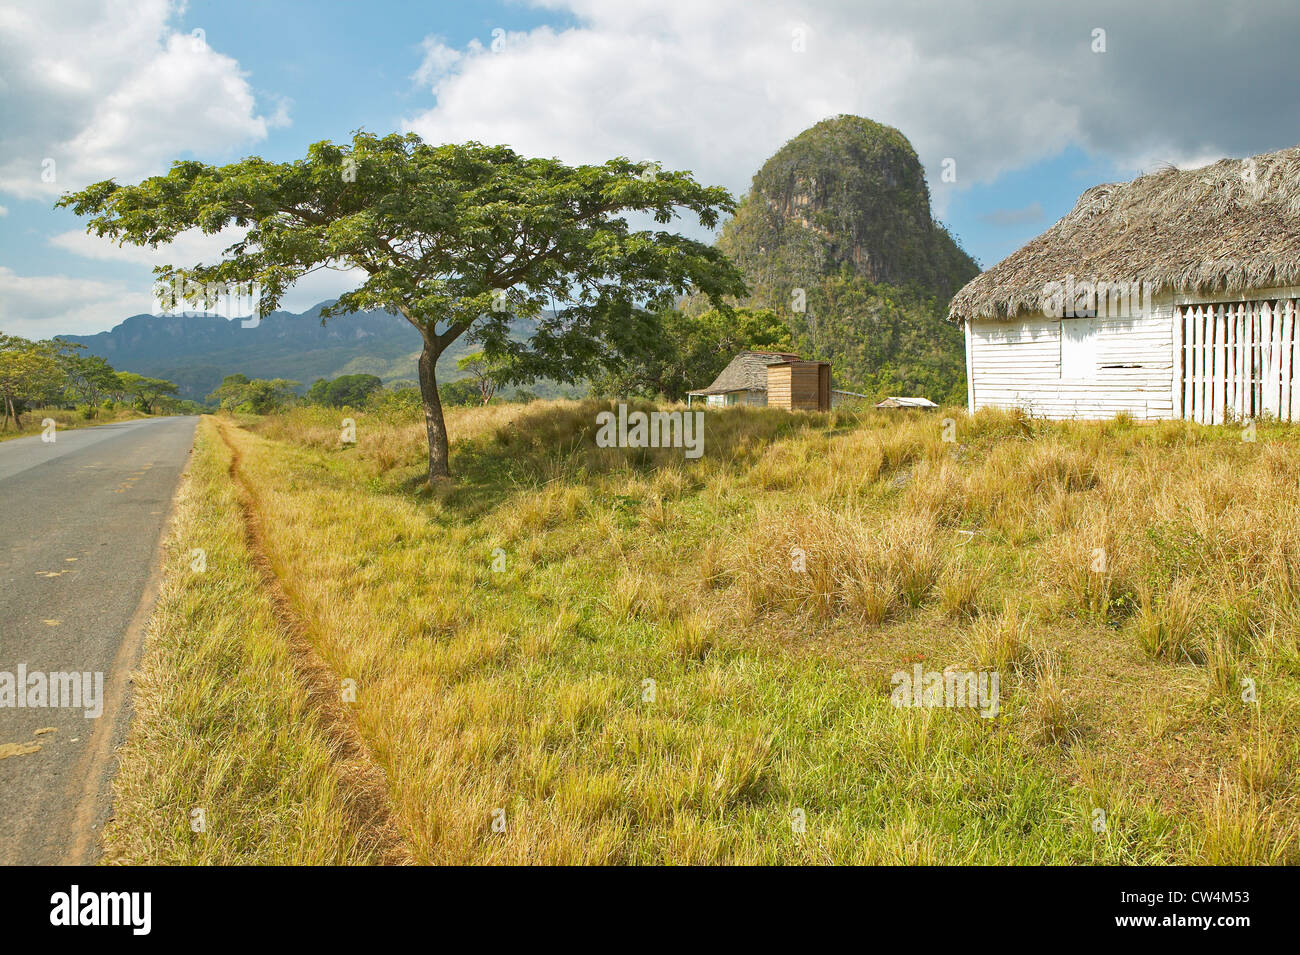 The Valle de Viñales, in central Cuba - Stock Image